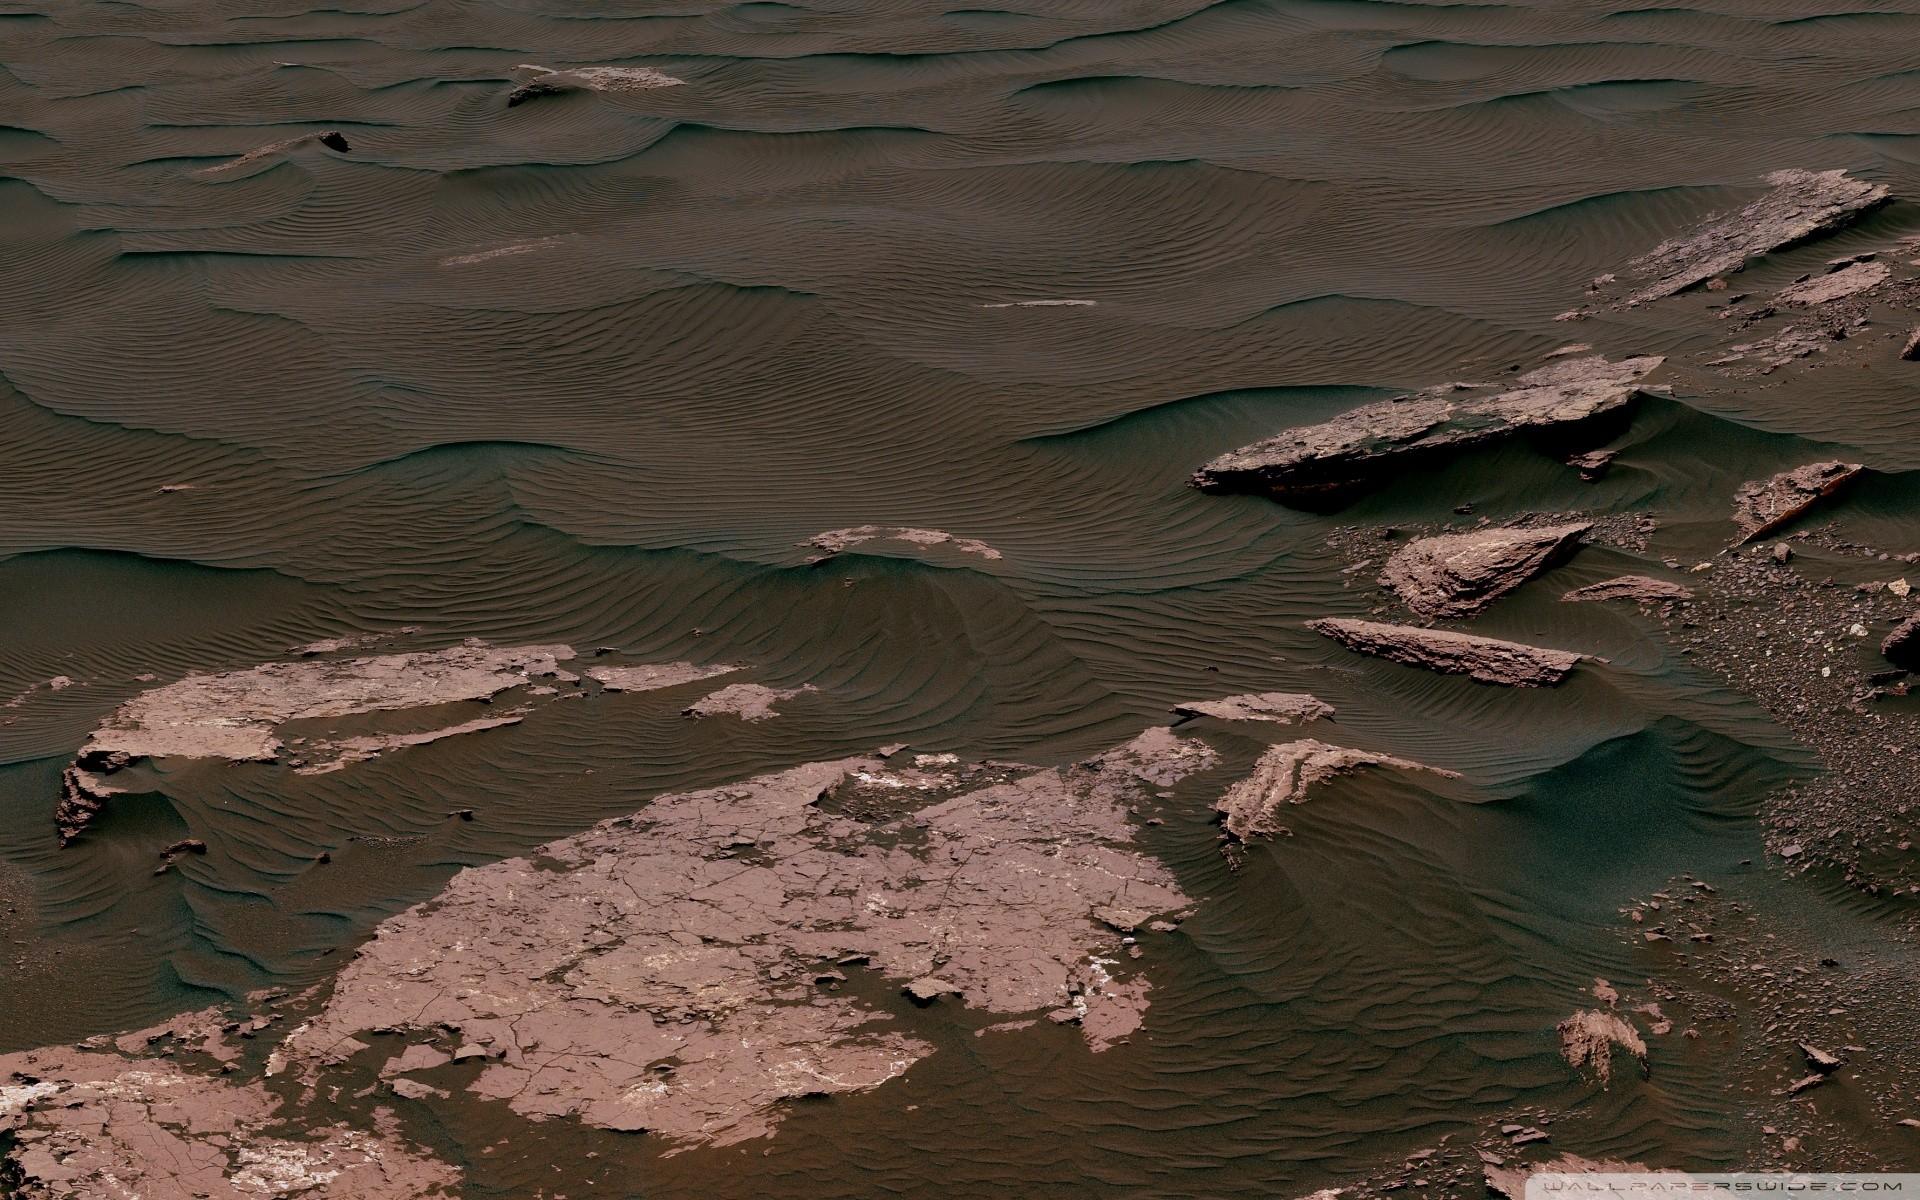 Res: 1920x1200, Curiosity Mars Rover at…